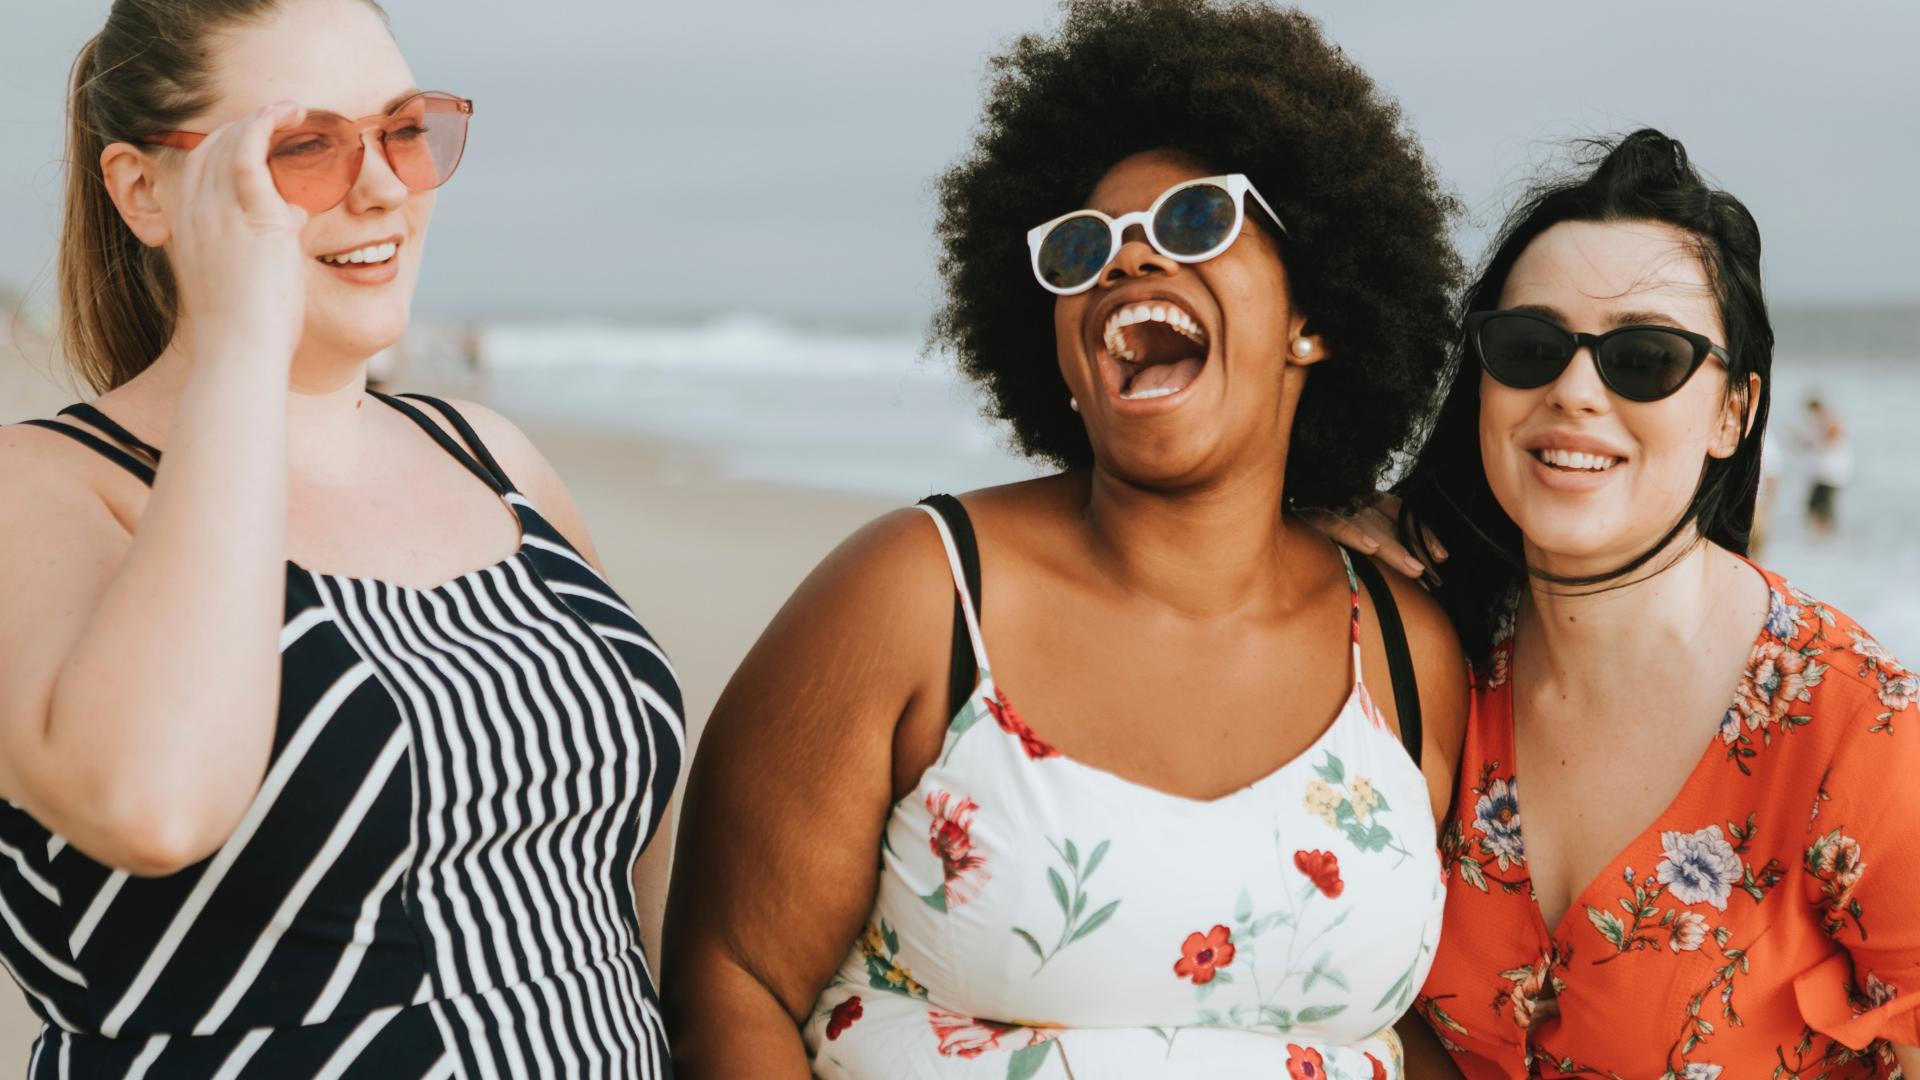 Drei kurvige Frauen lachen